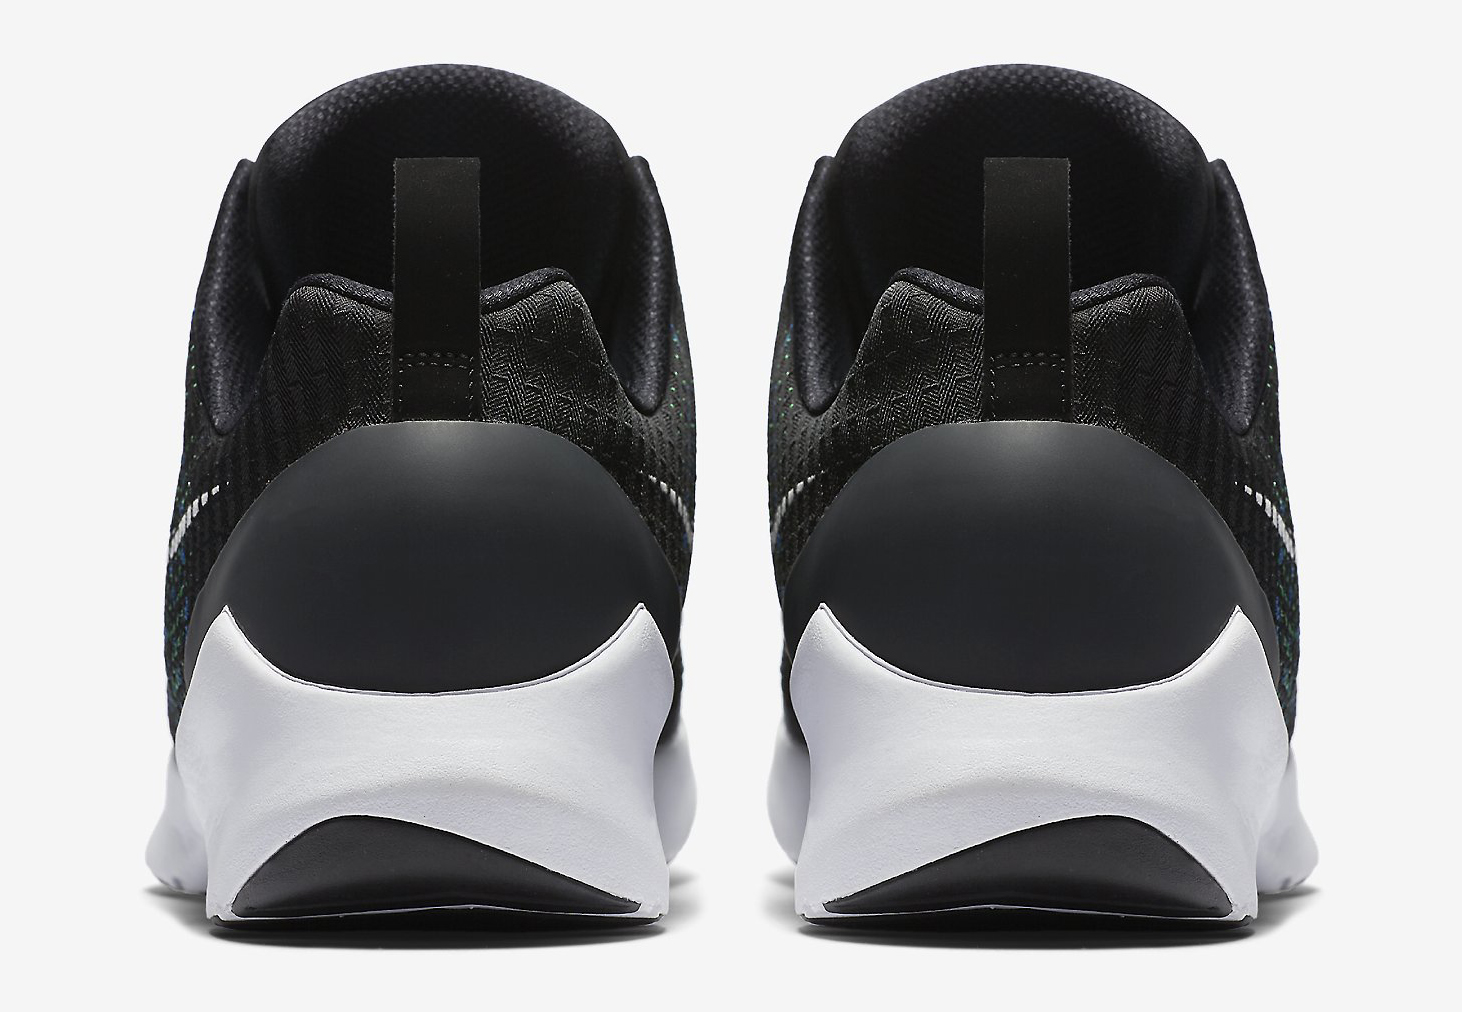 Nike Hyperadapt 843871-001 Heel